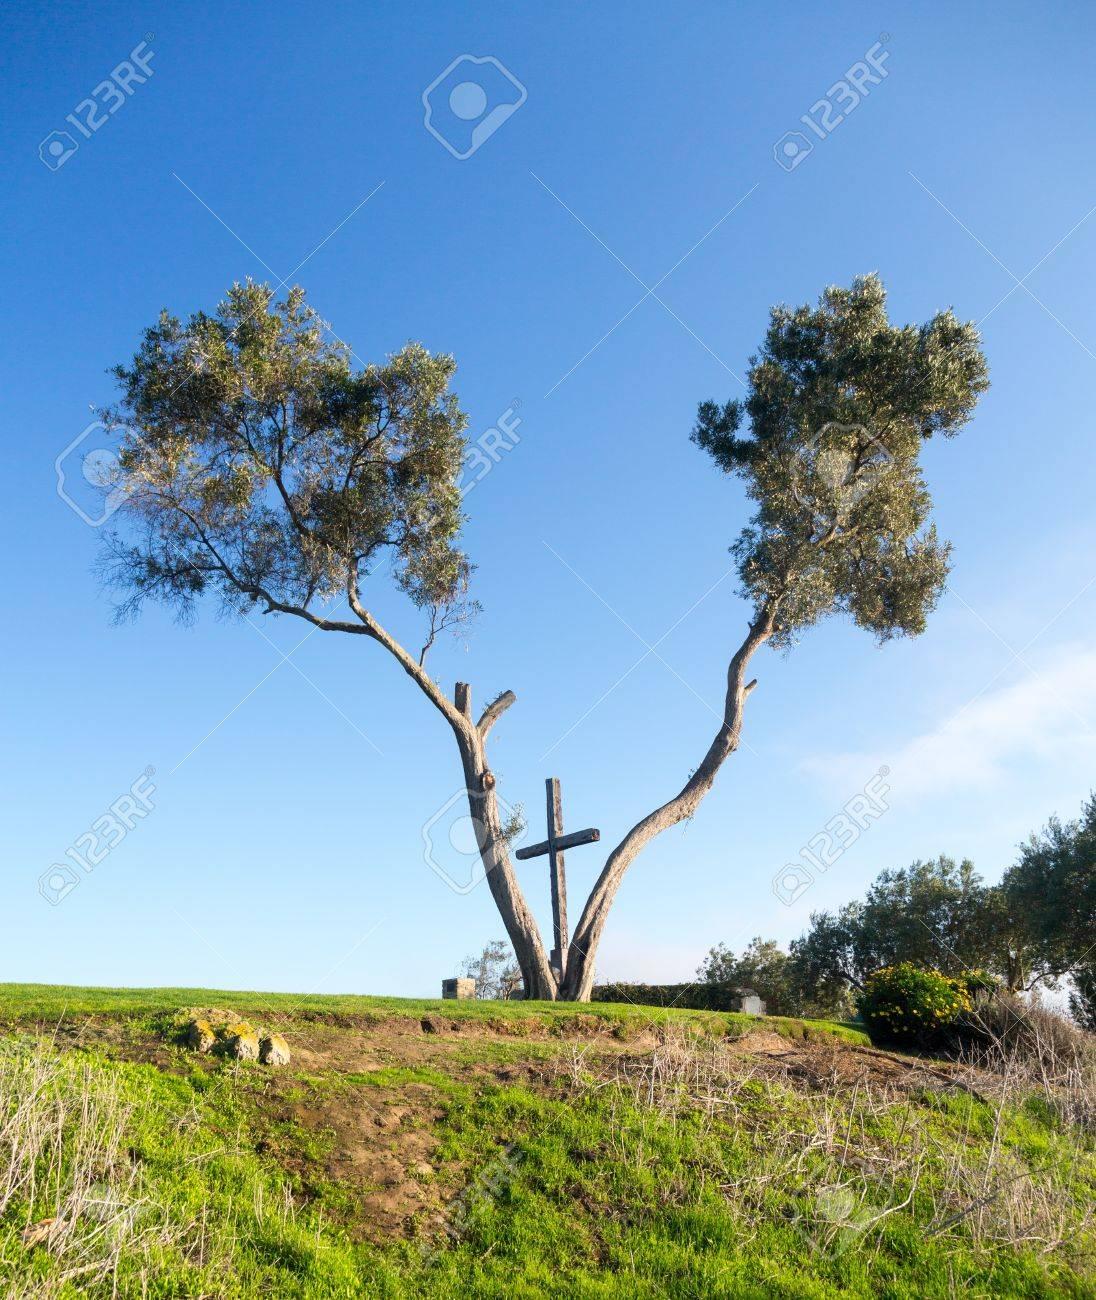 Serra Cruz En El Grant Park De Ventura California Establece Entre ...